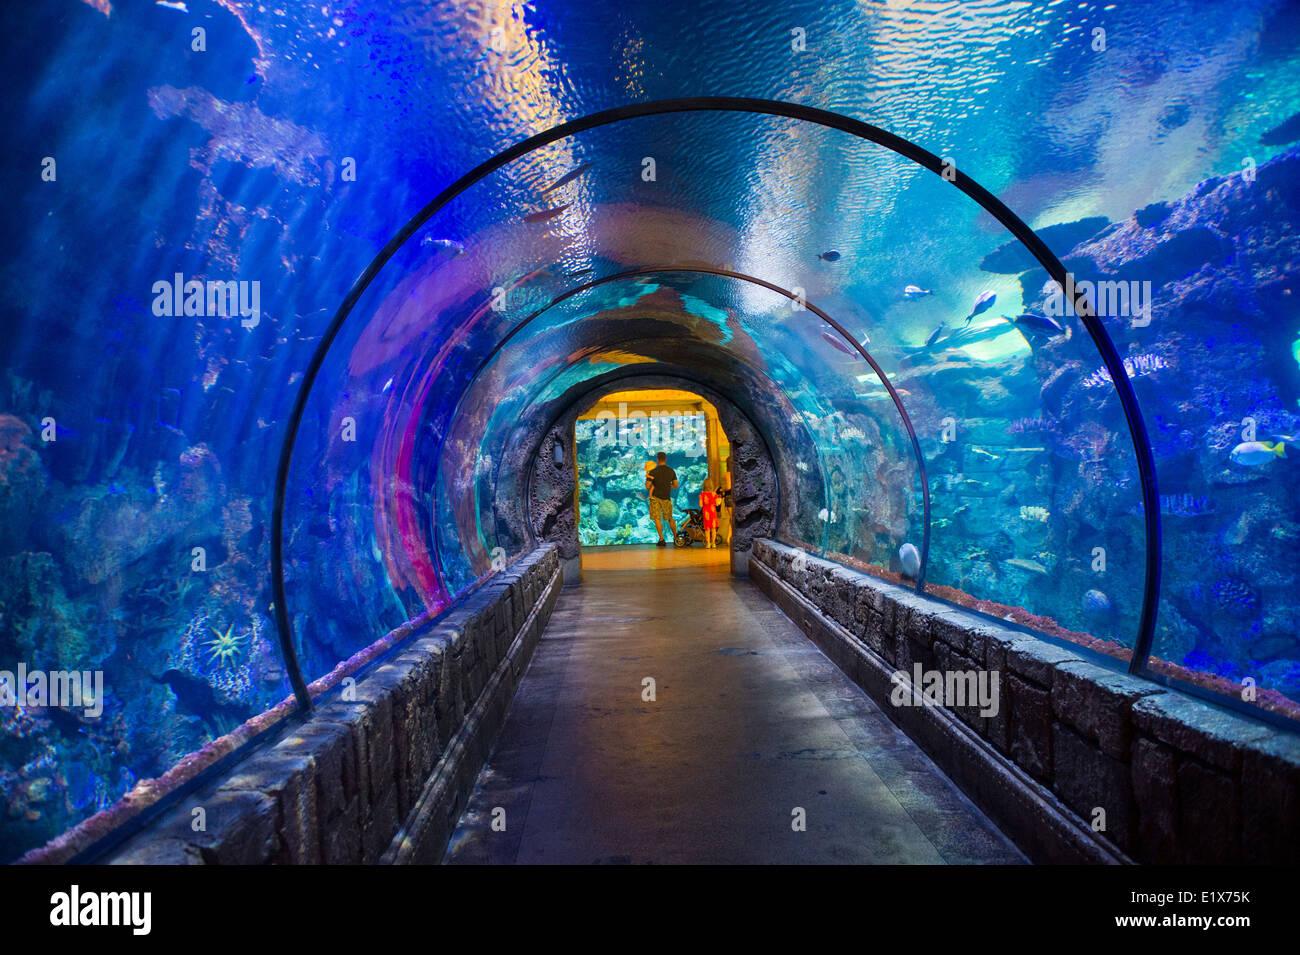 The Shark Reef Aquarium at Mandalay Bay hotel and casino ...